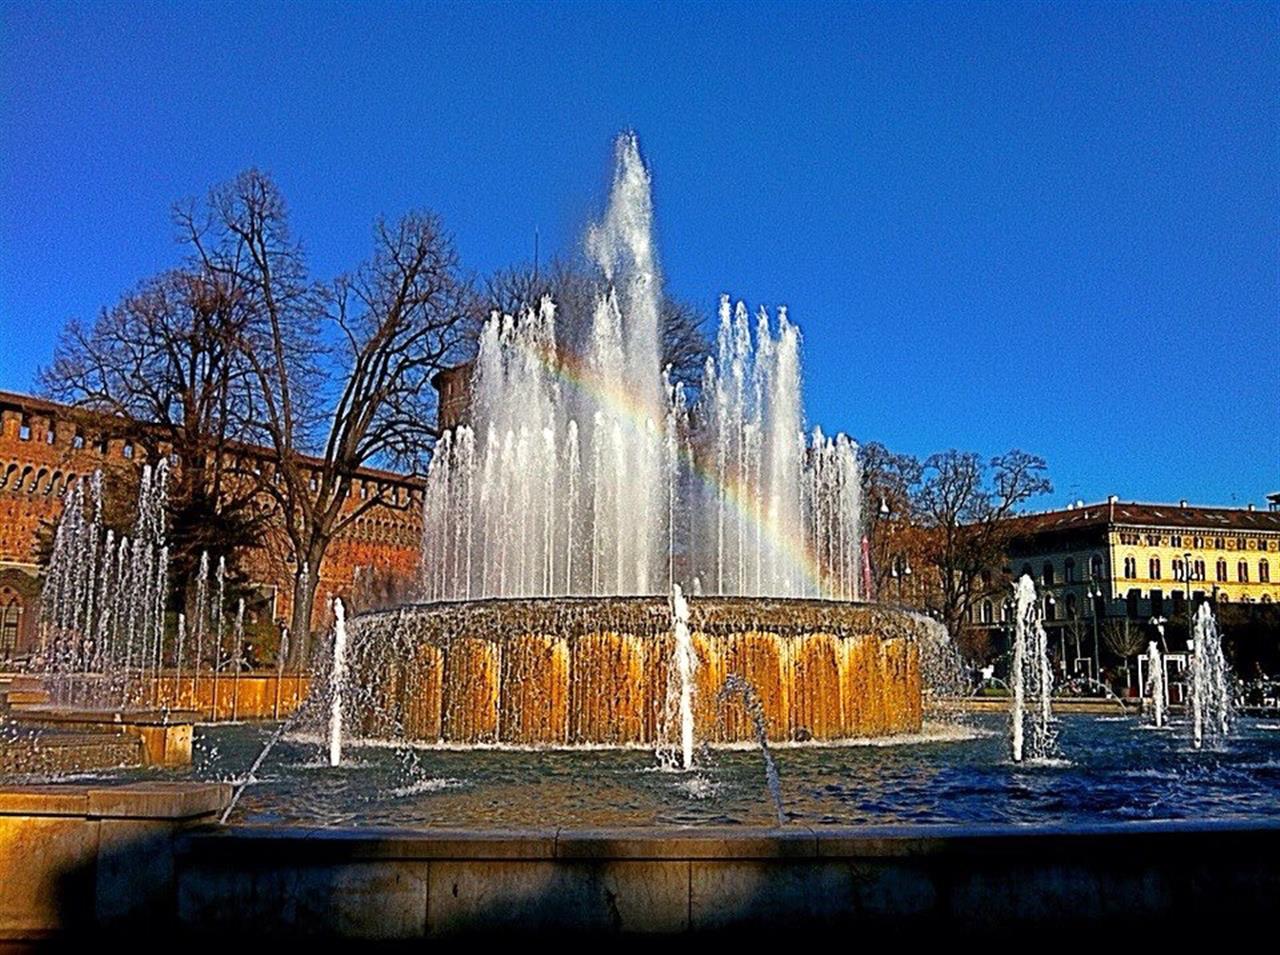 #PiazzaCastello #Milano